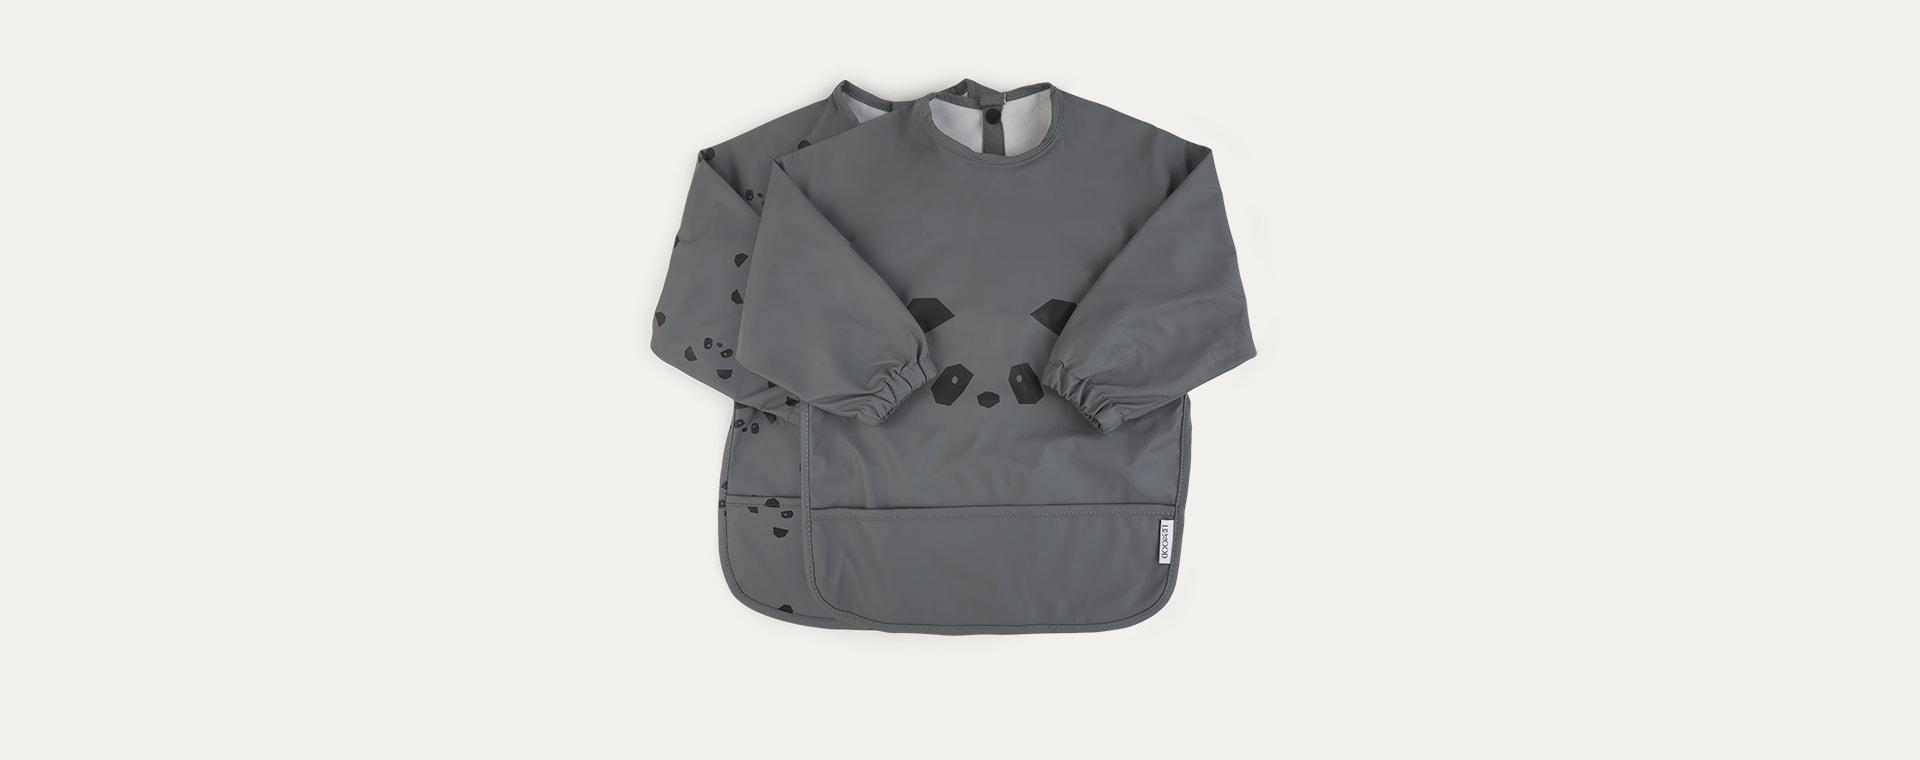 Panda stone grey Liewood 2-Pack Merle Cape Bib